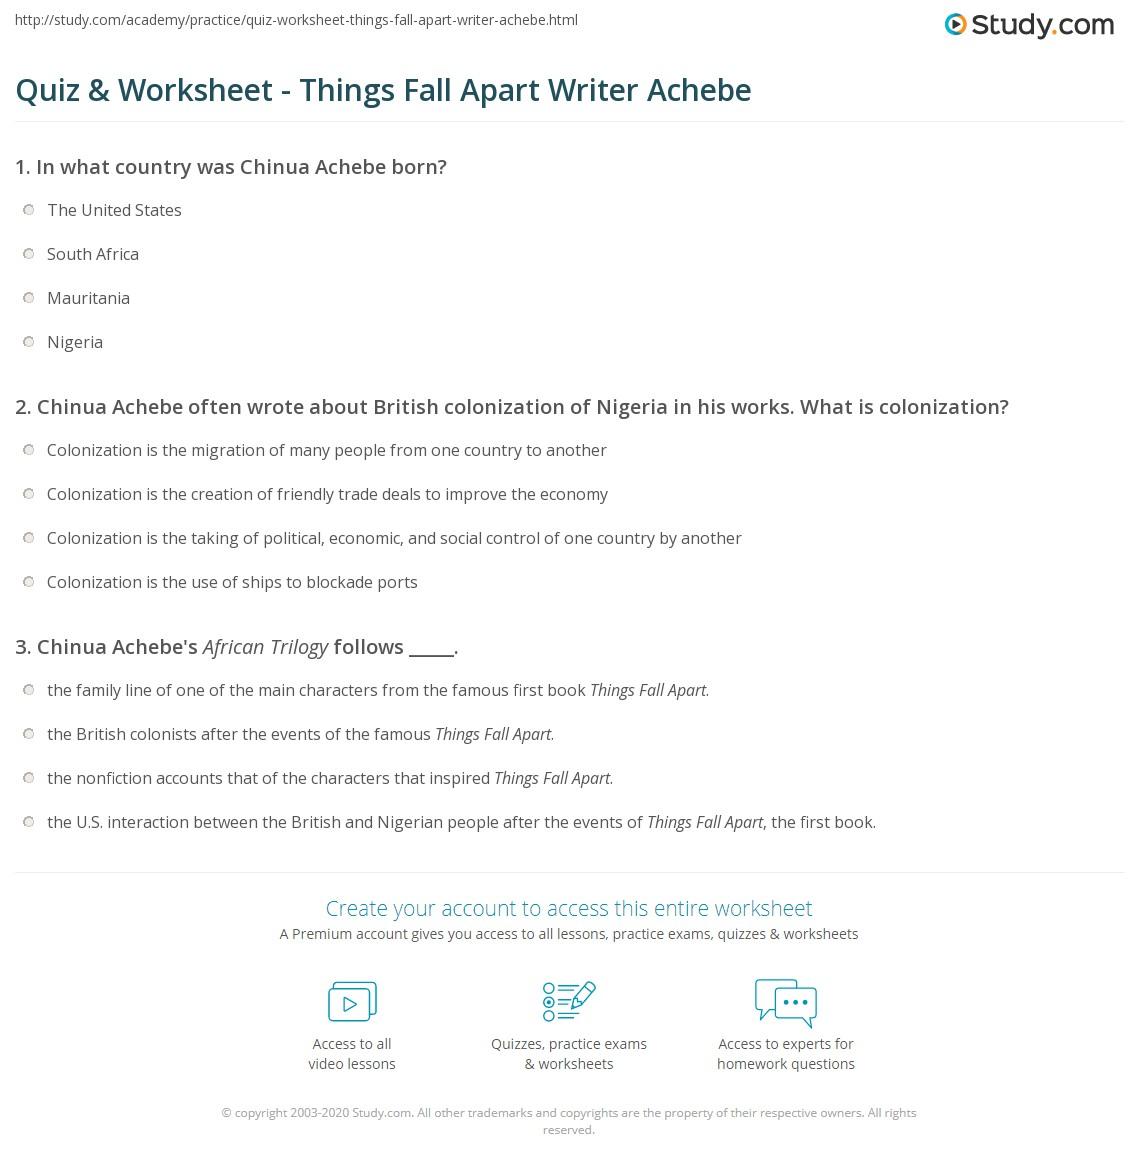 Quiz & Worksheet - Things Fall Apart Writer Achebe